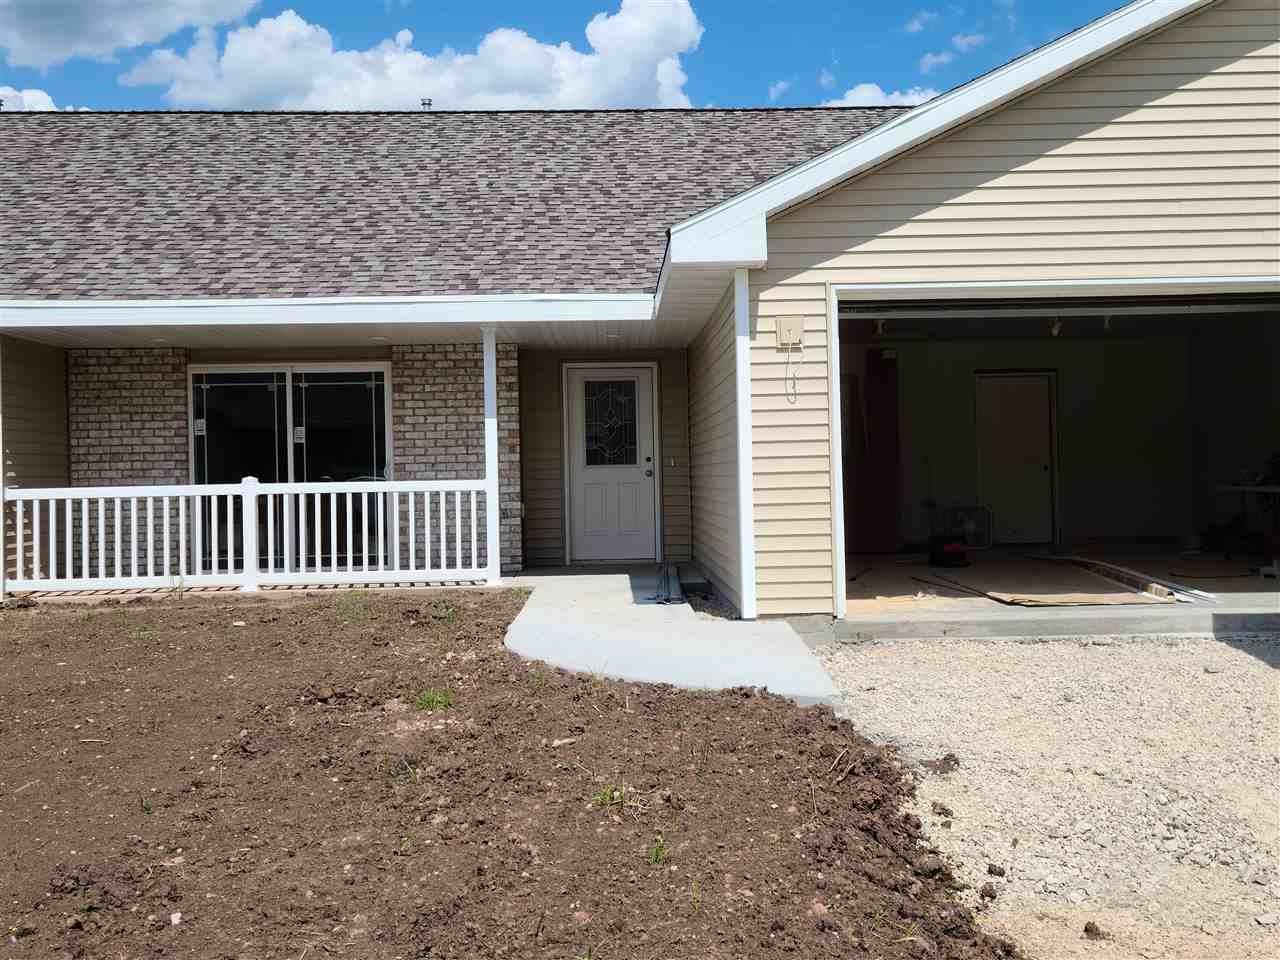 123 STONE CASTLE Drive, Fond du Lac, WI 54935 - MLS#: 50235190